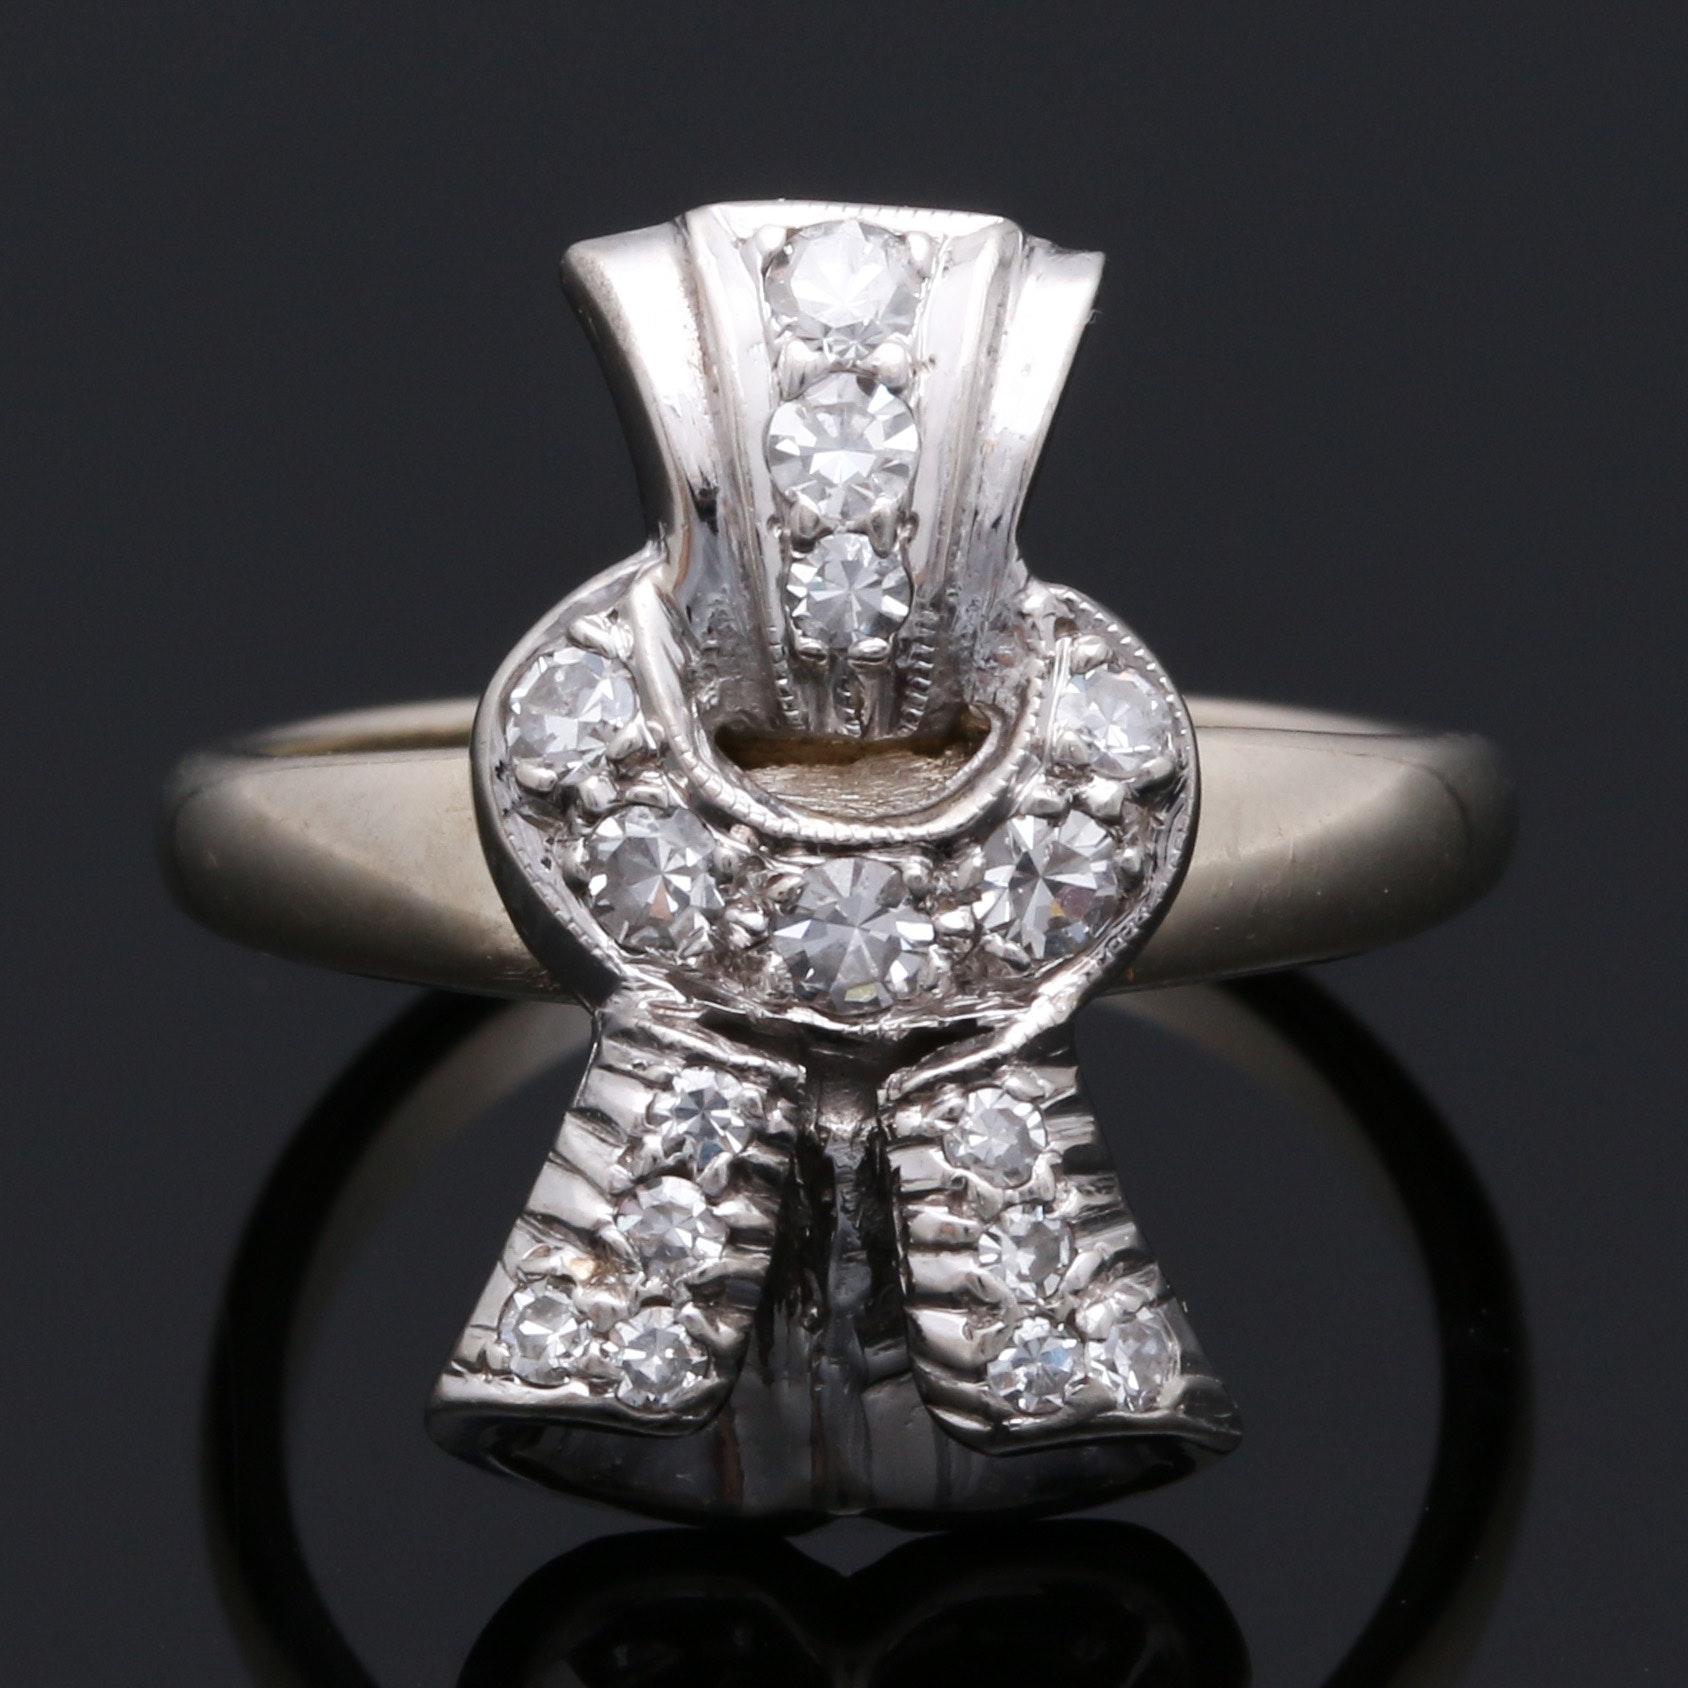 14K White Gold Diamond Knot Ring